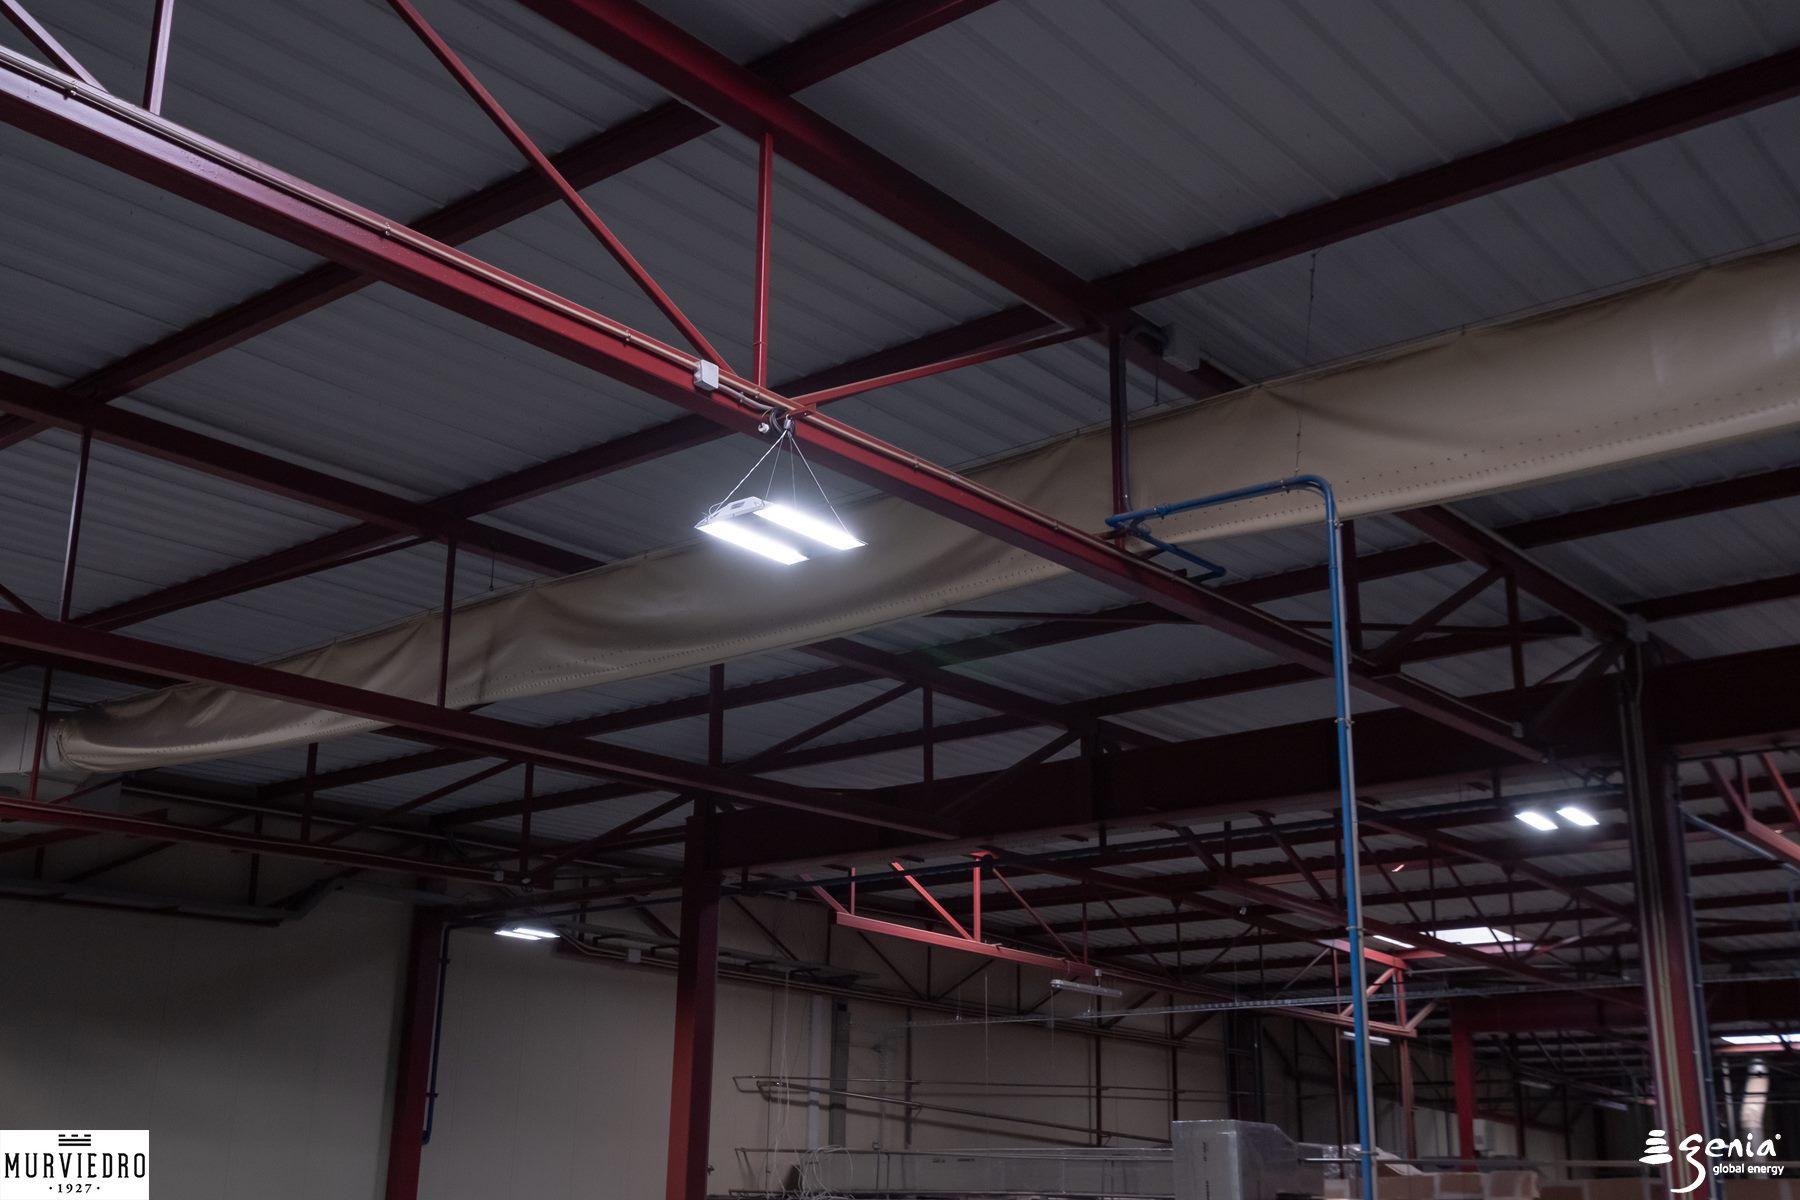 iluminacion-inteligente-industrial-bodegas-murviedro-almacen-detalle